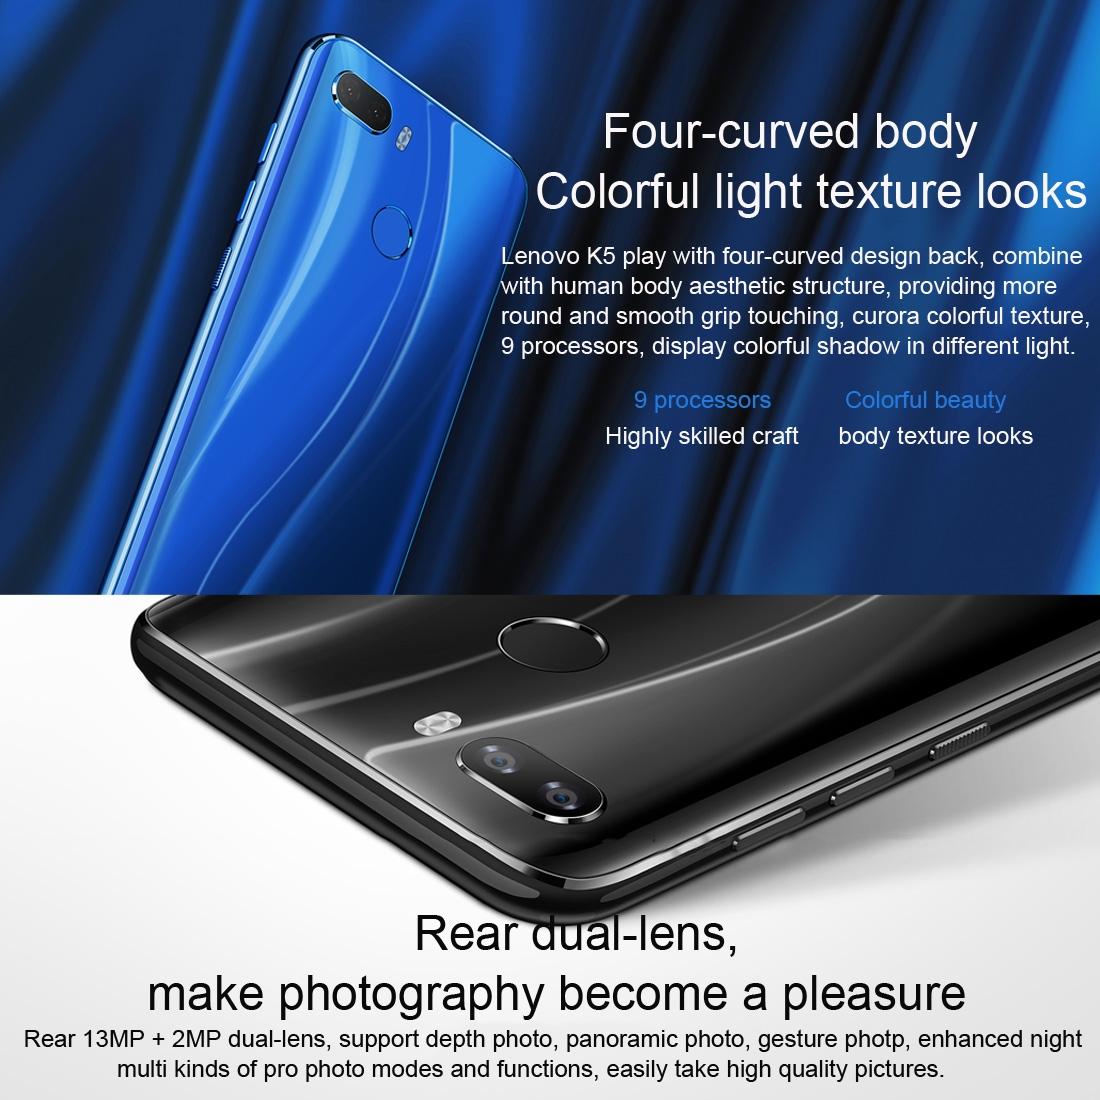 i.ibb.co/G5fx8d7/Smartphone-3-GB-32-GB-Jogo-Lenovo-K5-Play-Azul-5.jpg